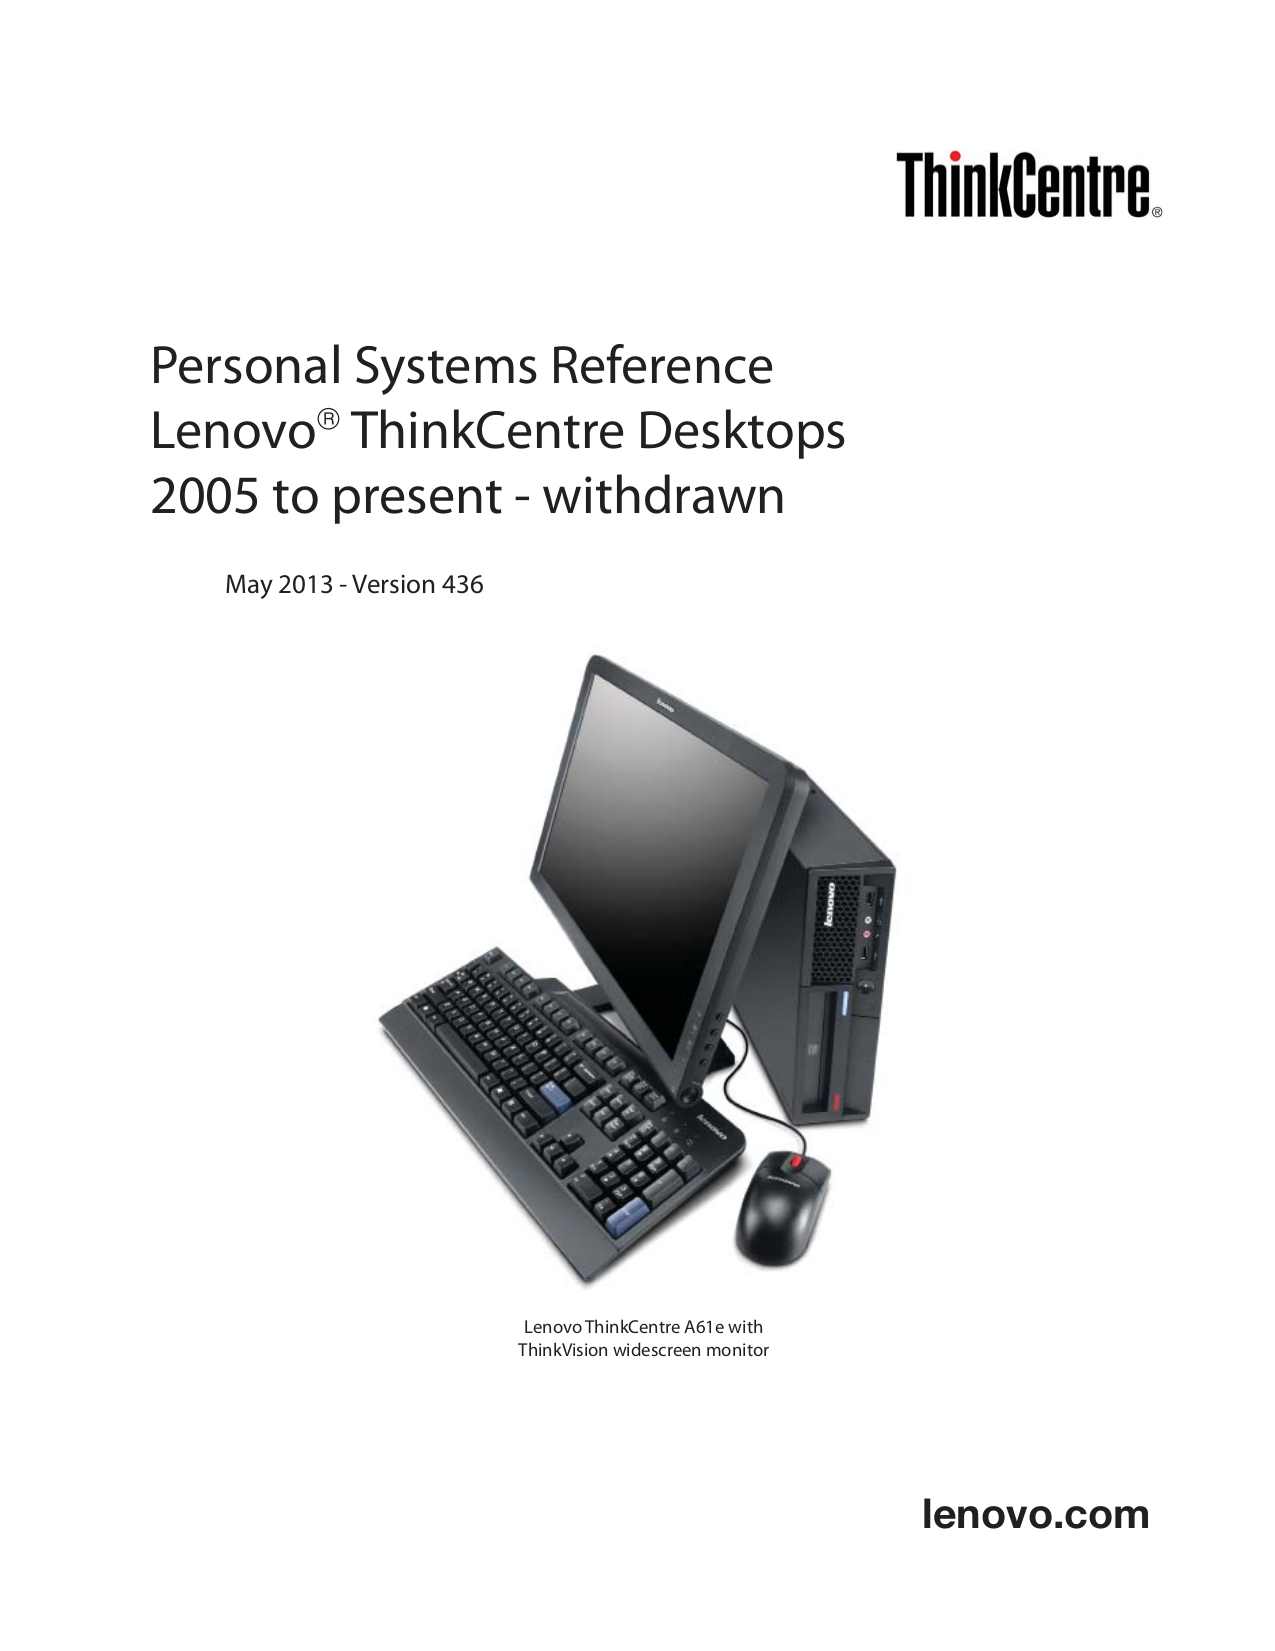 pdf for Lenovo Desktop ThinkCentre E50 9215 manual